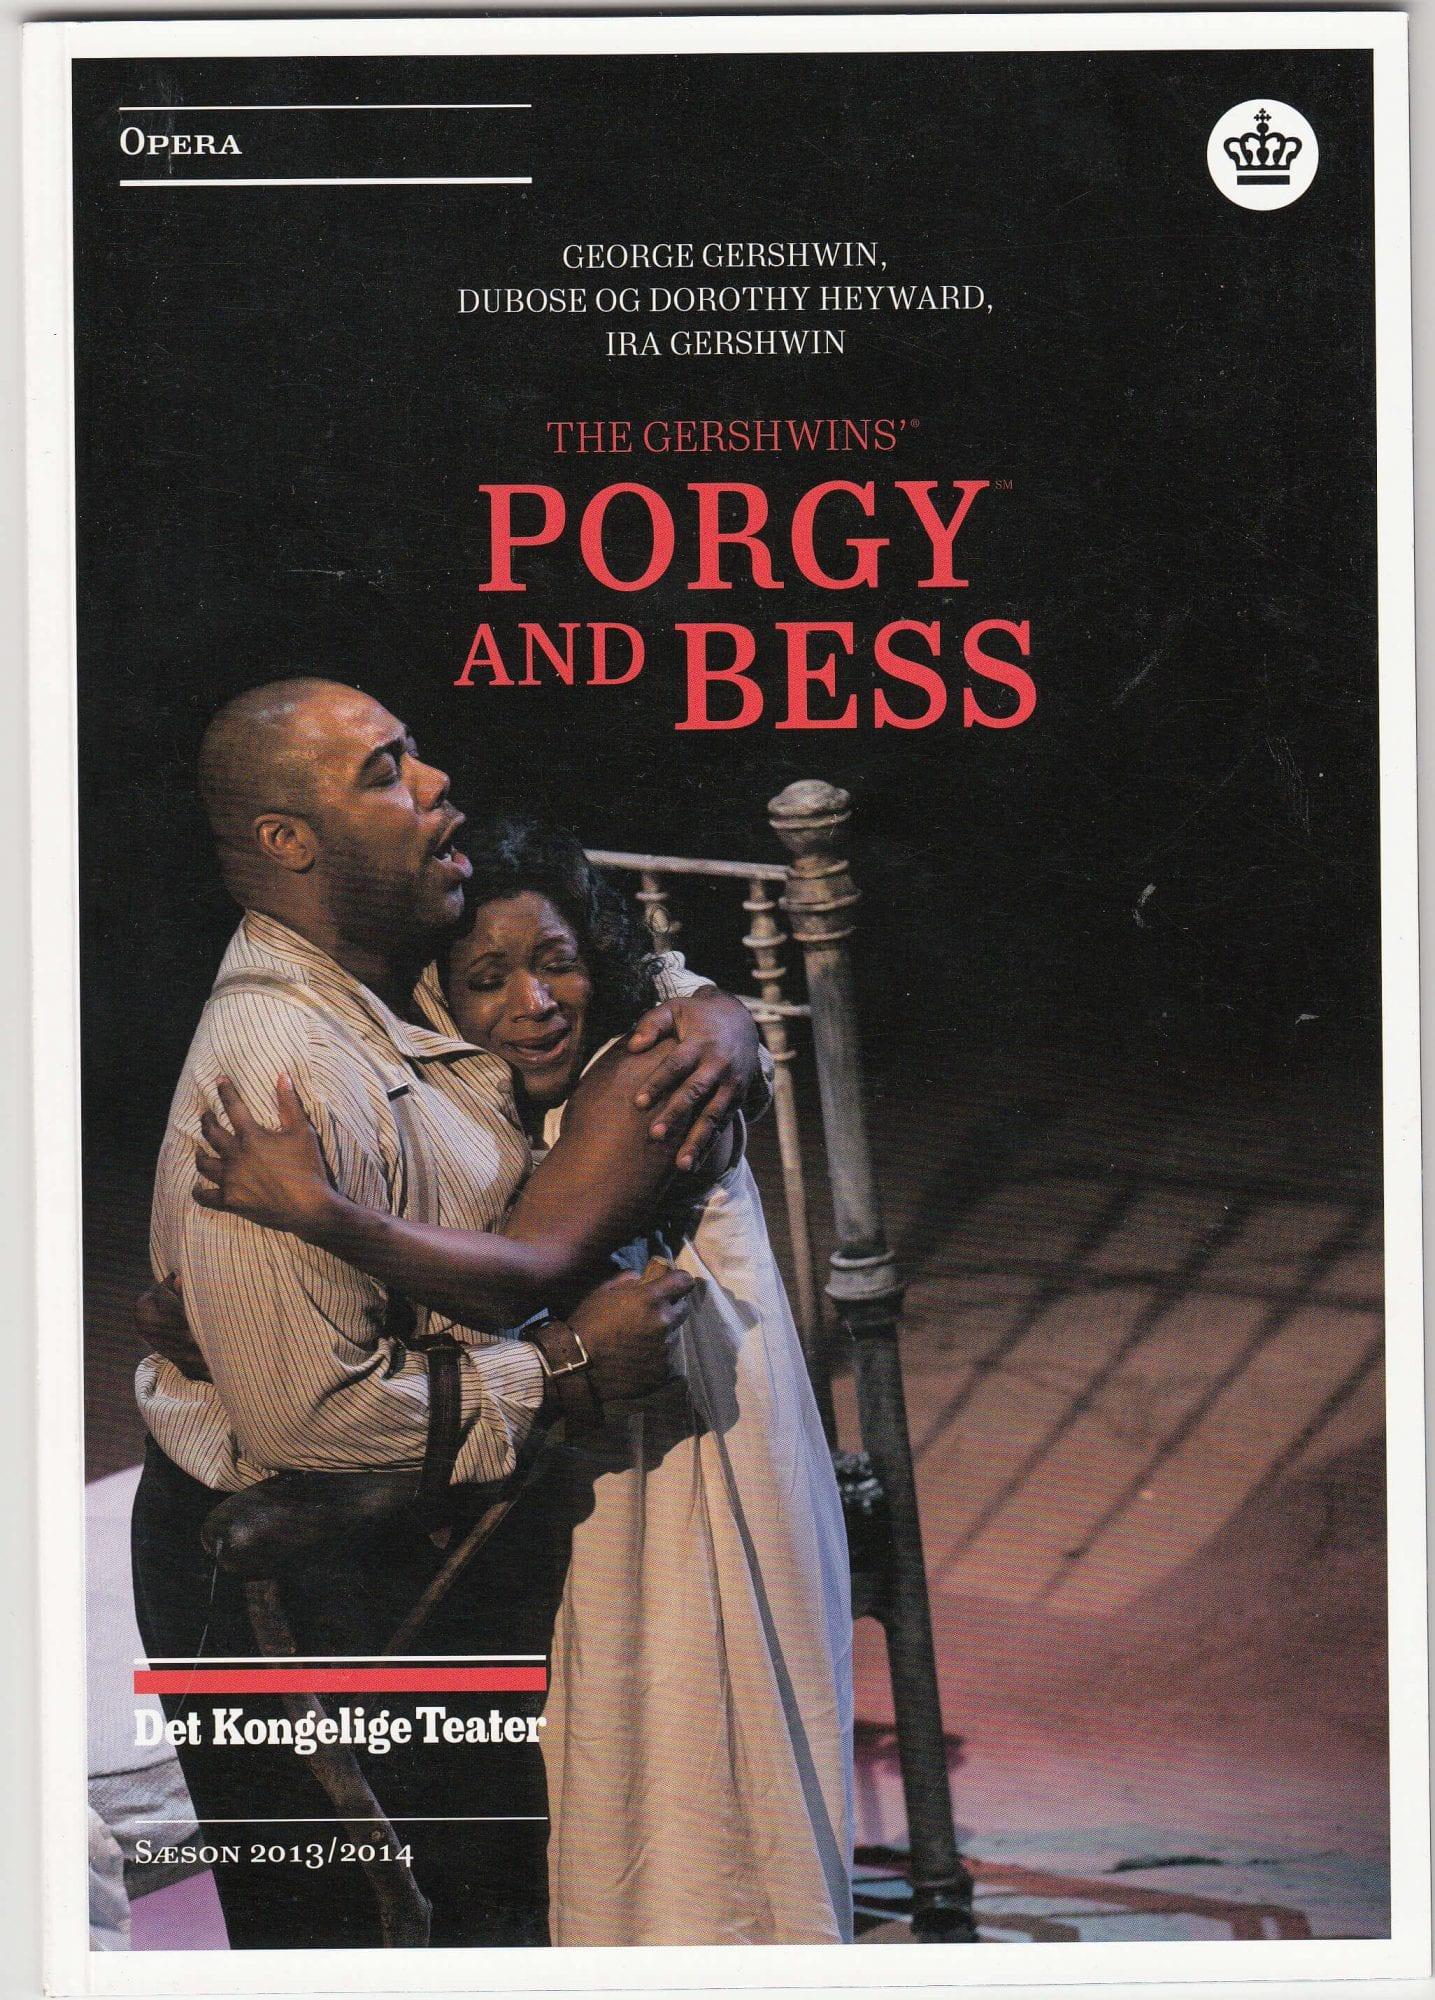 Porgy och Bess 1935 synopsis